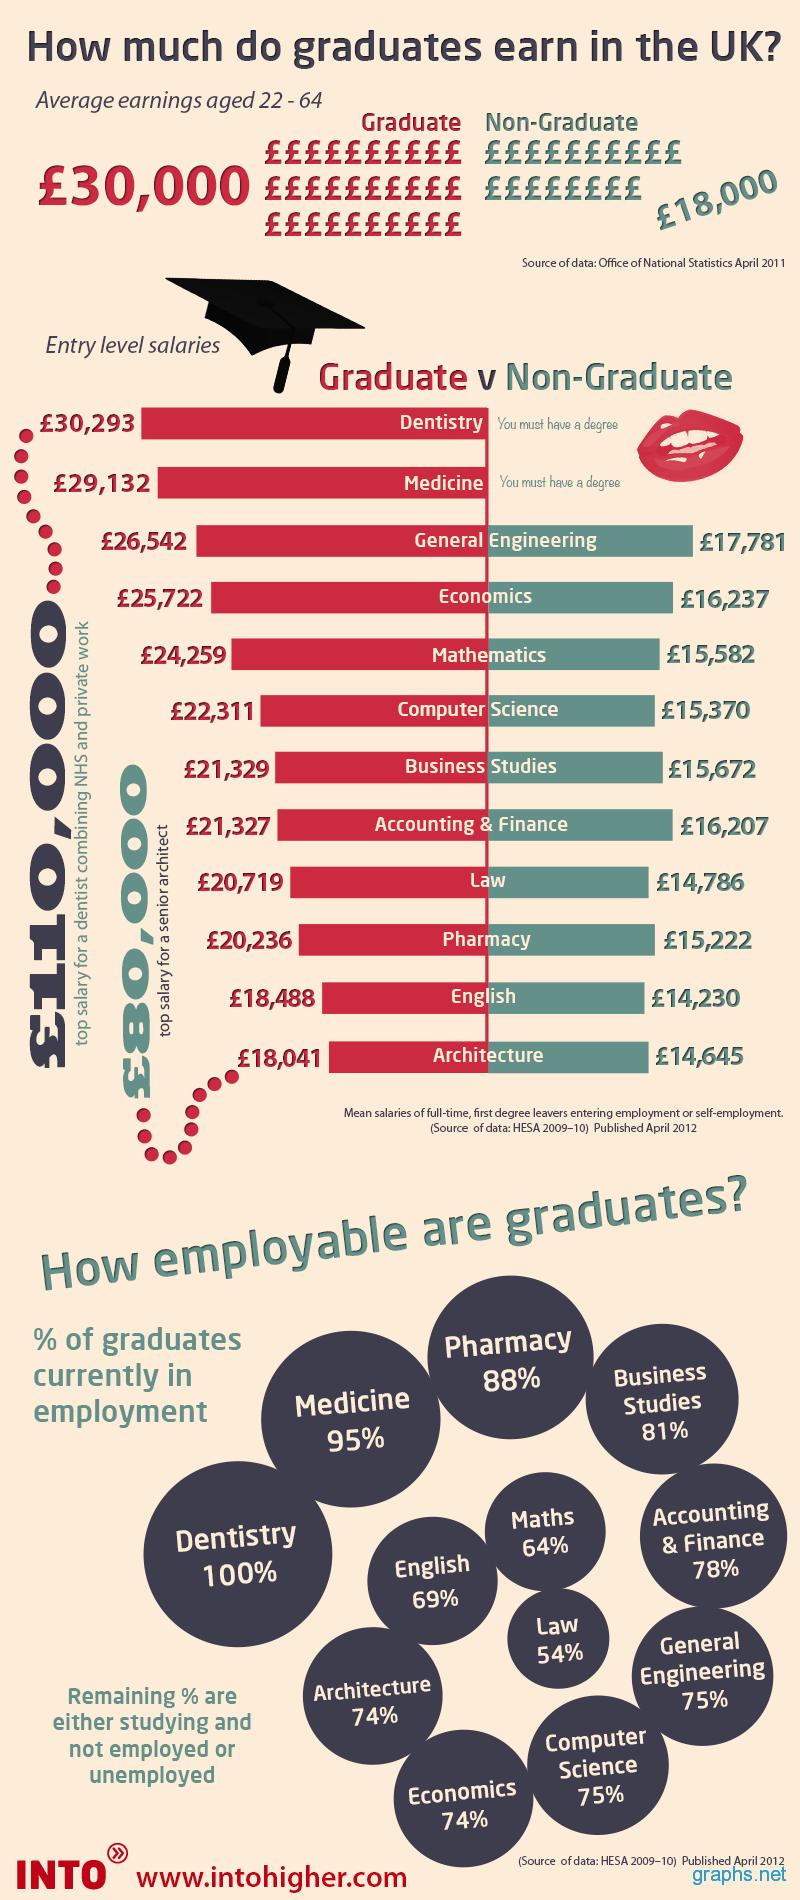 Graduate vs. Non-Graduate Earnings in the UK